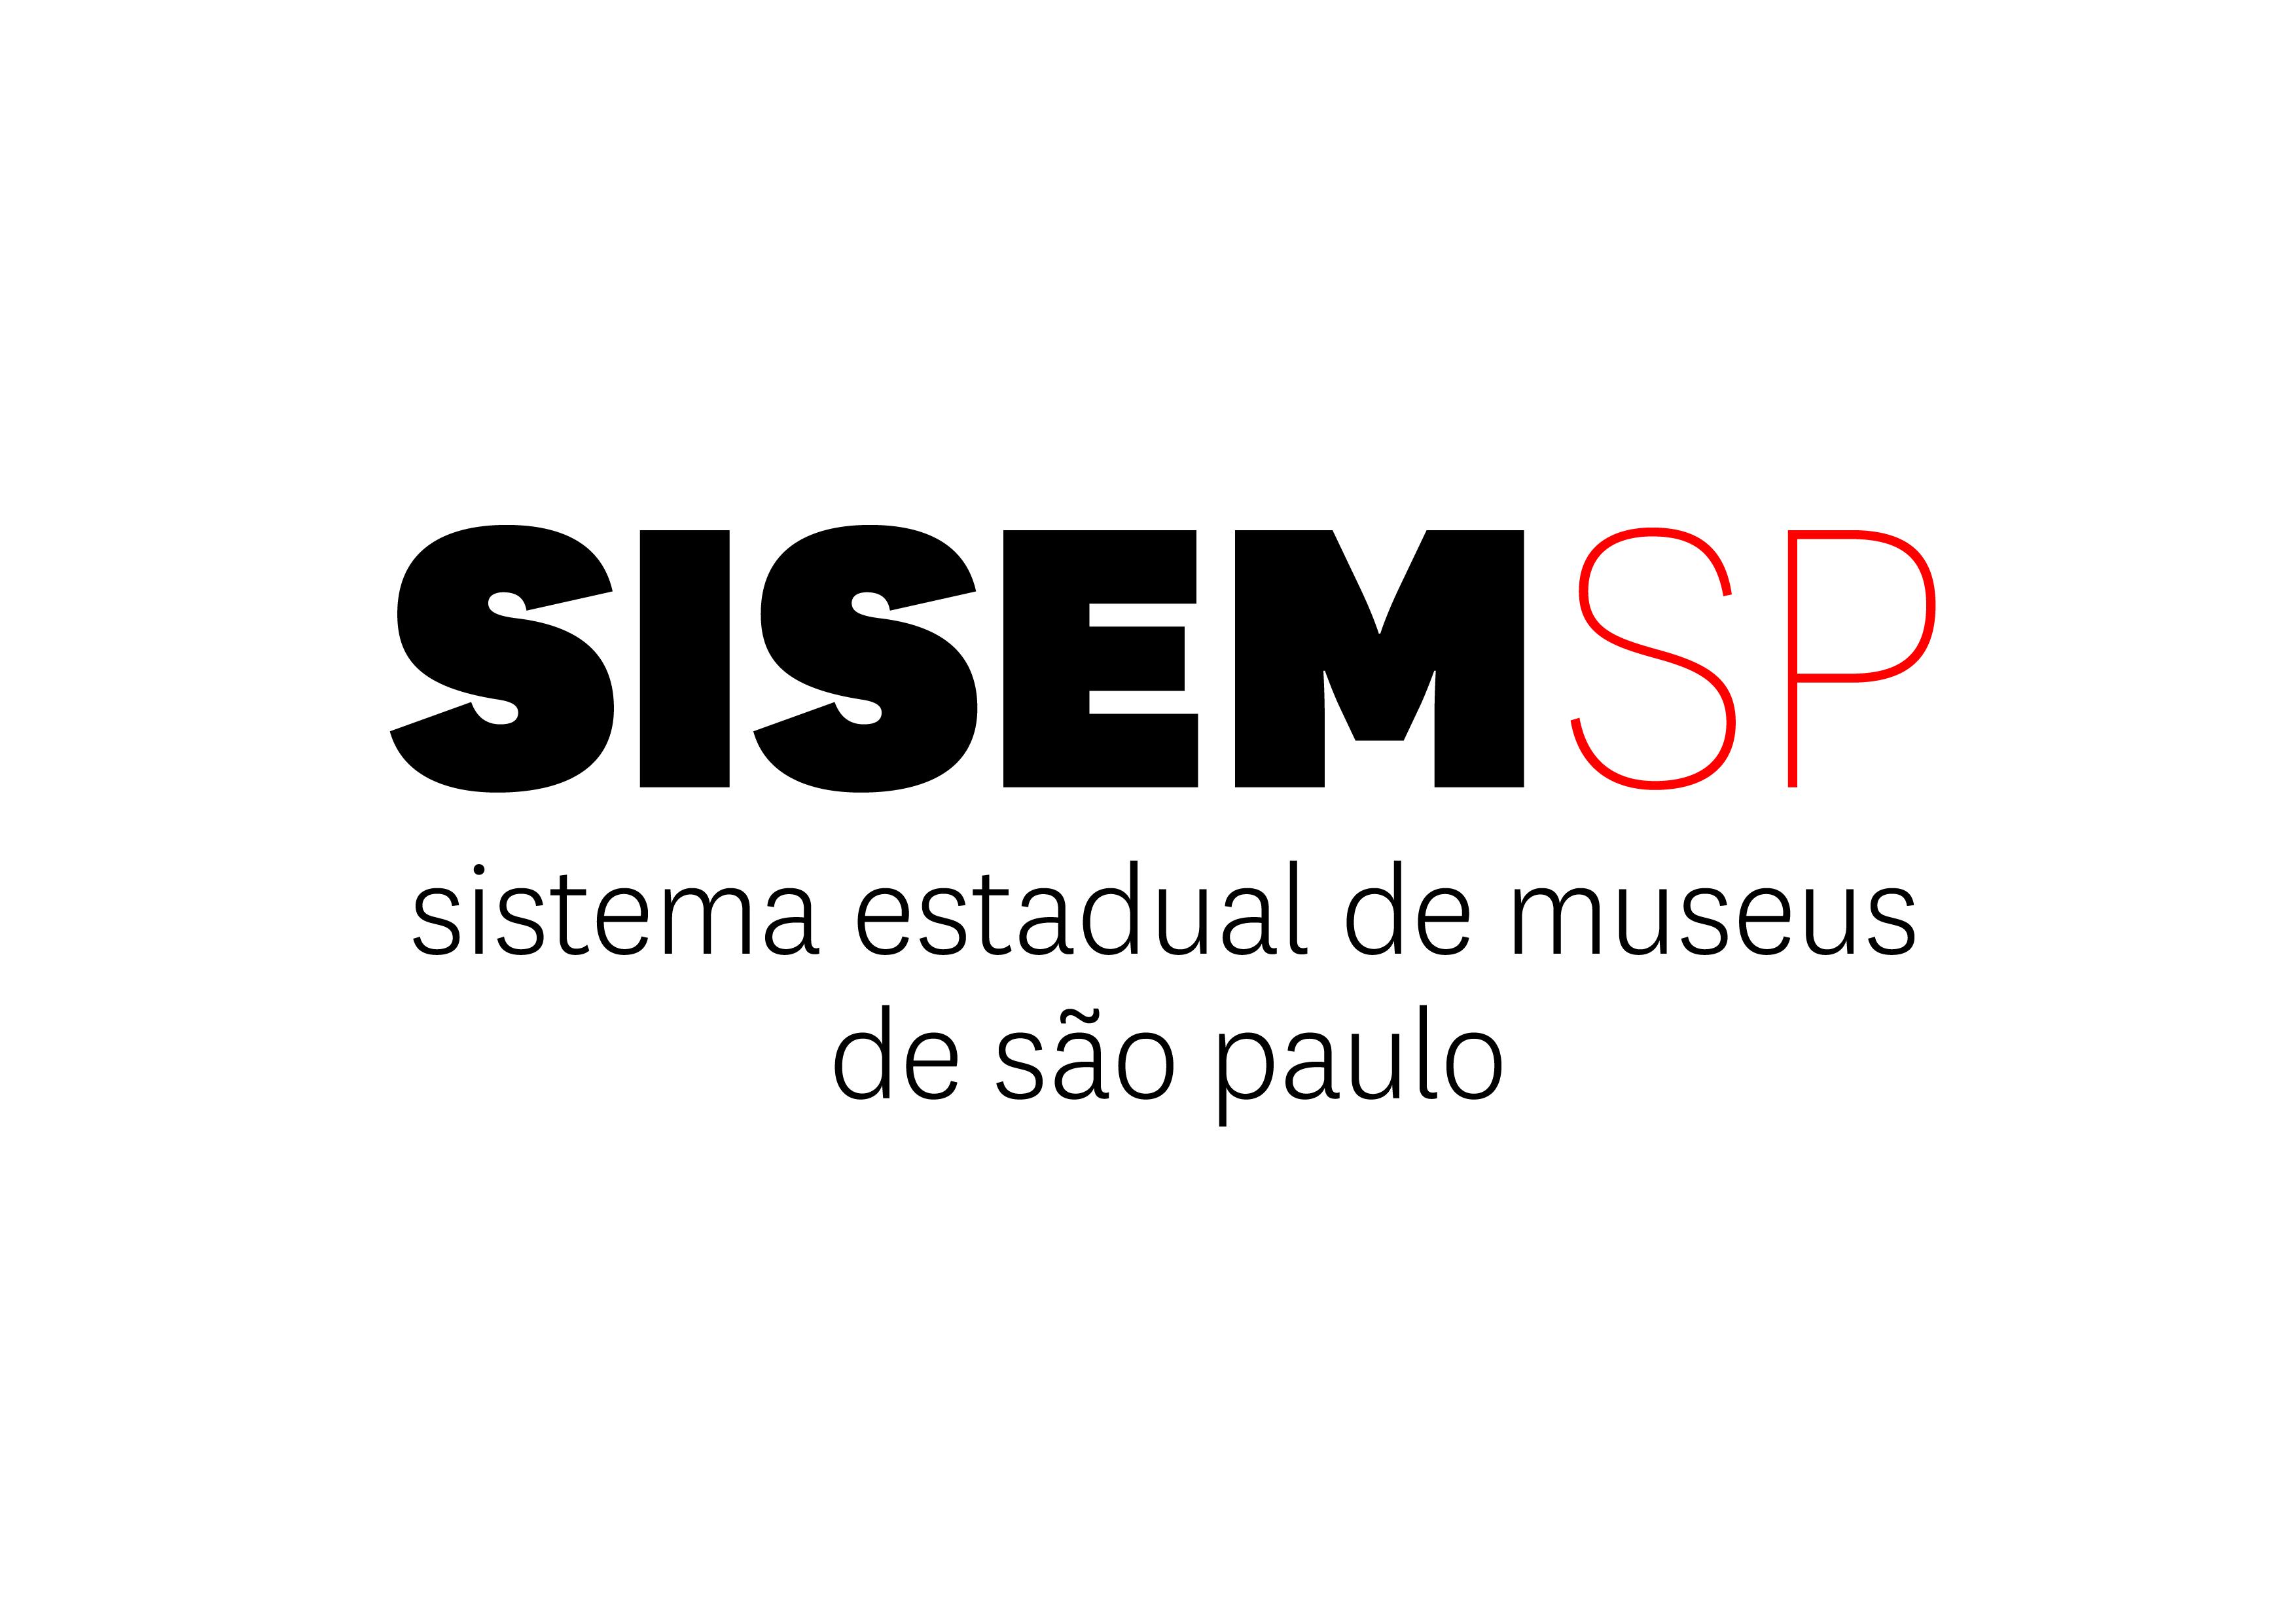 SISEM